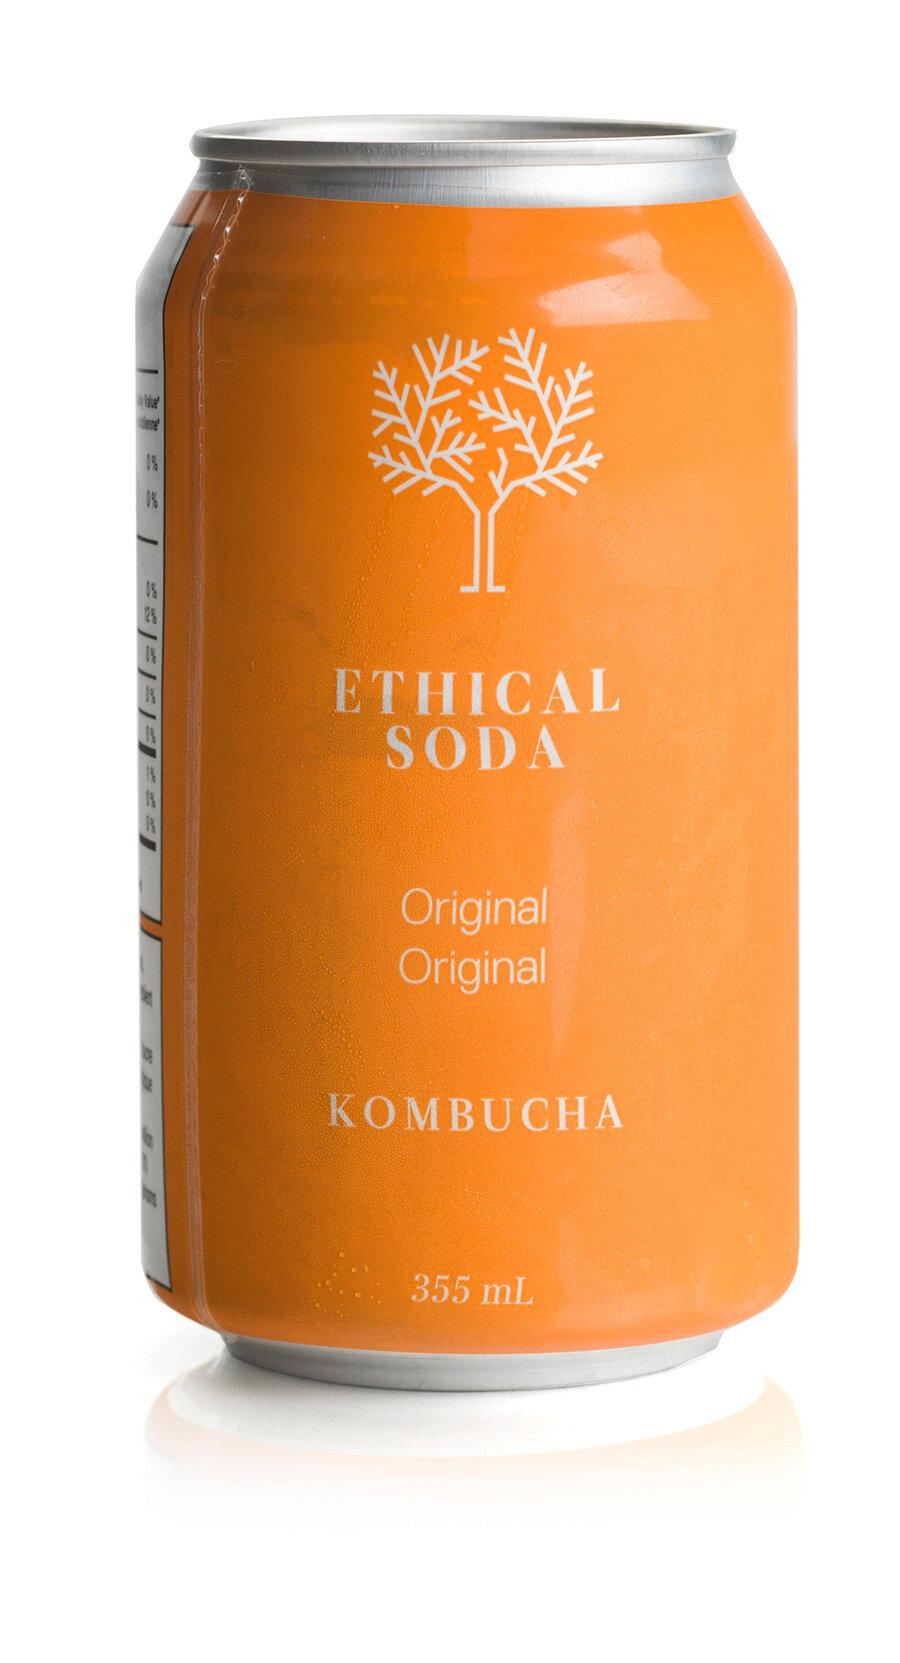 Hibiscus Ethical Soda_1553.jpg